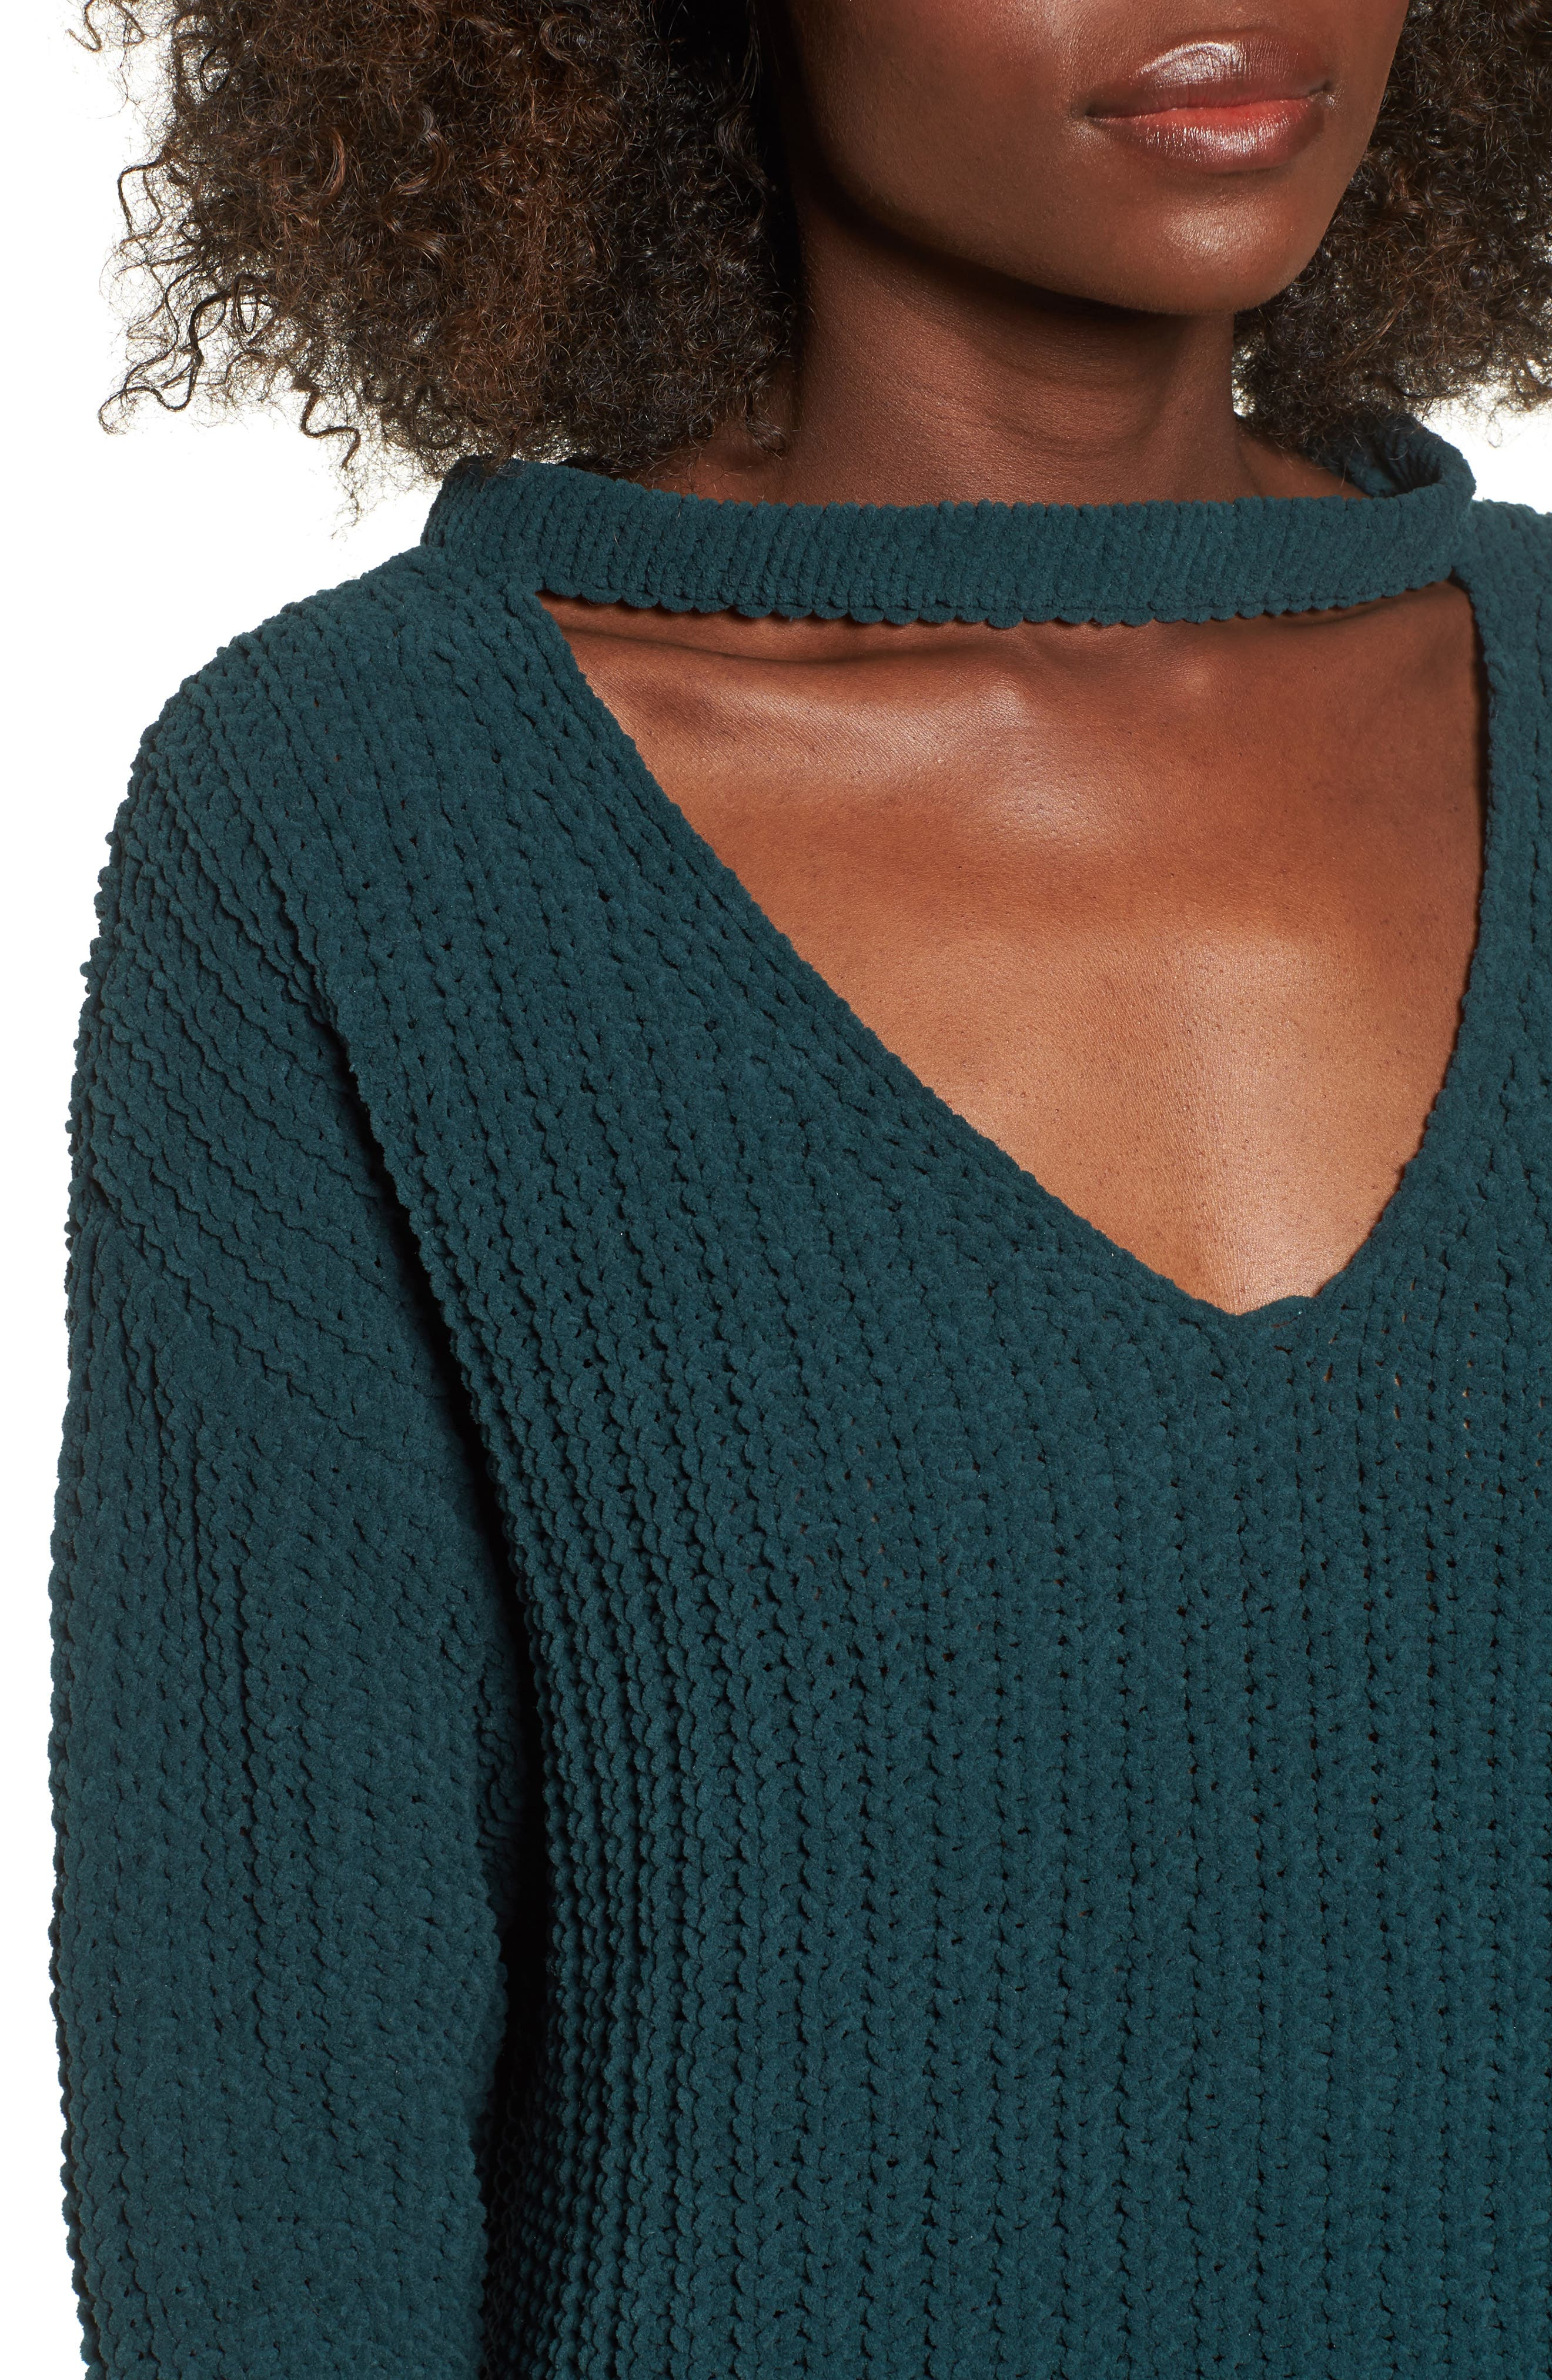 Mary Lous Choker Sweater,                             Alternate thumbnail 4, color,                             300